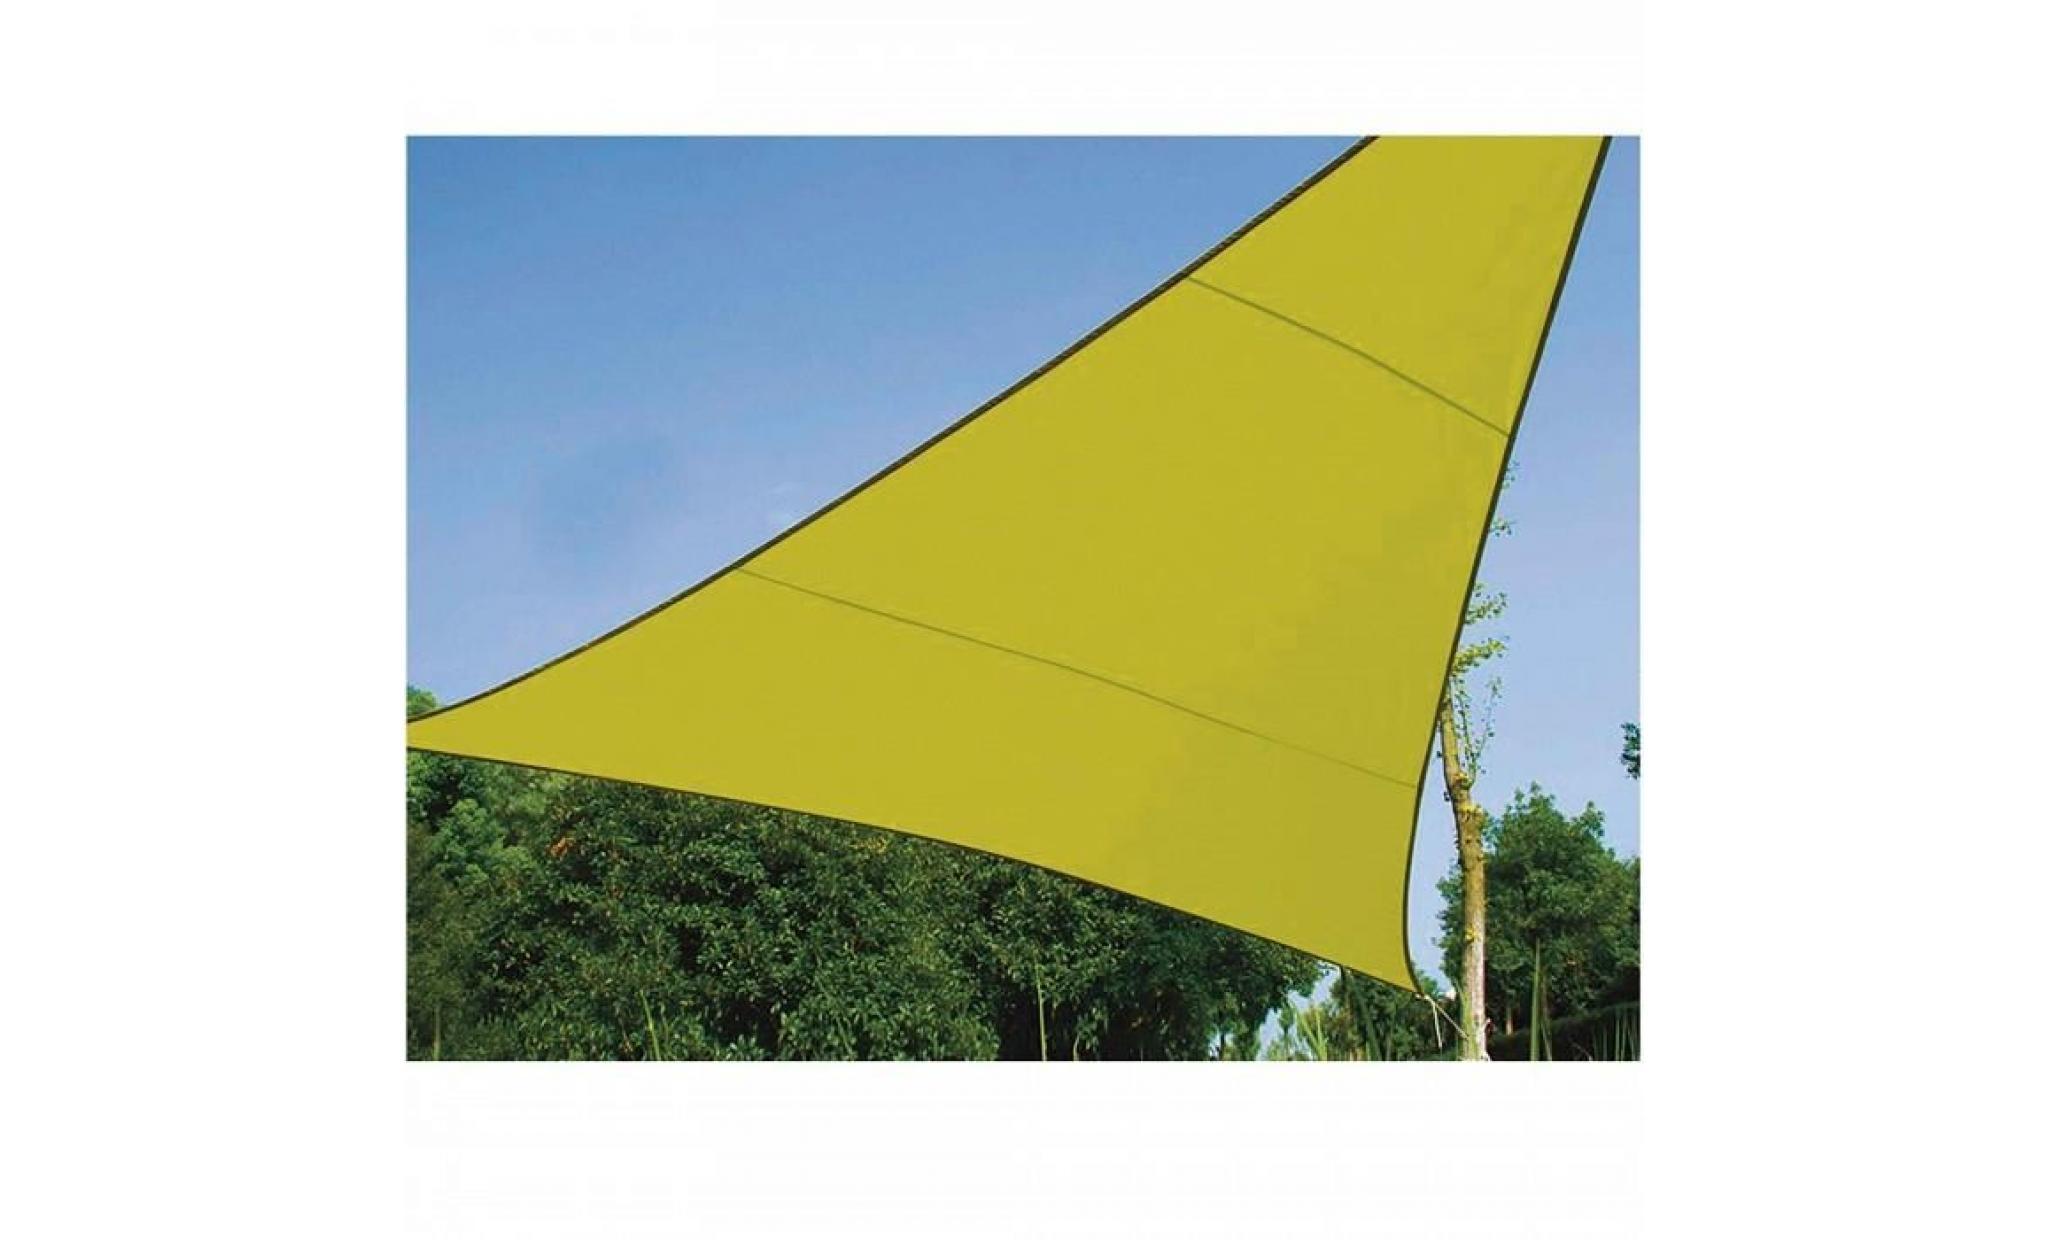 5 x 5 x 5 m voile d ombrage triangle 5 m ideale p 1